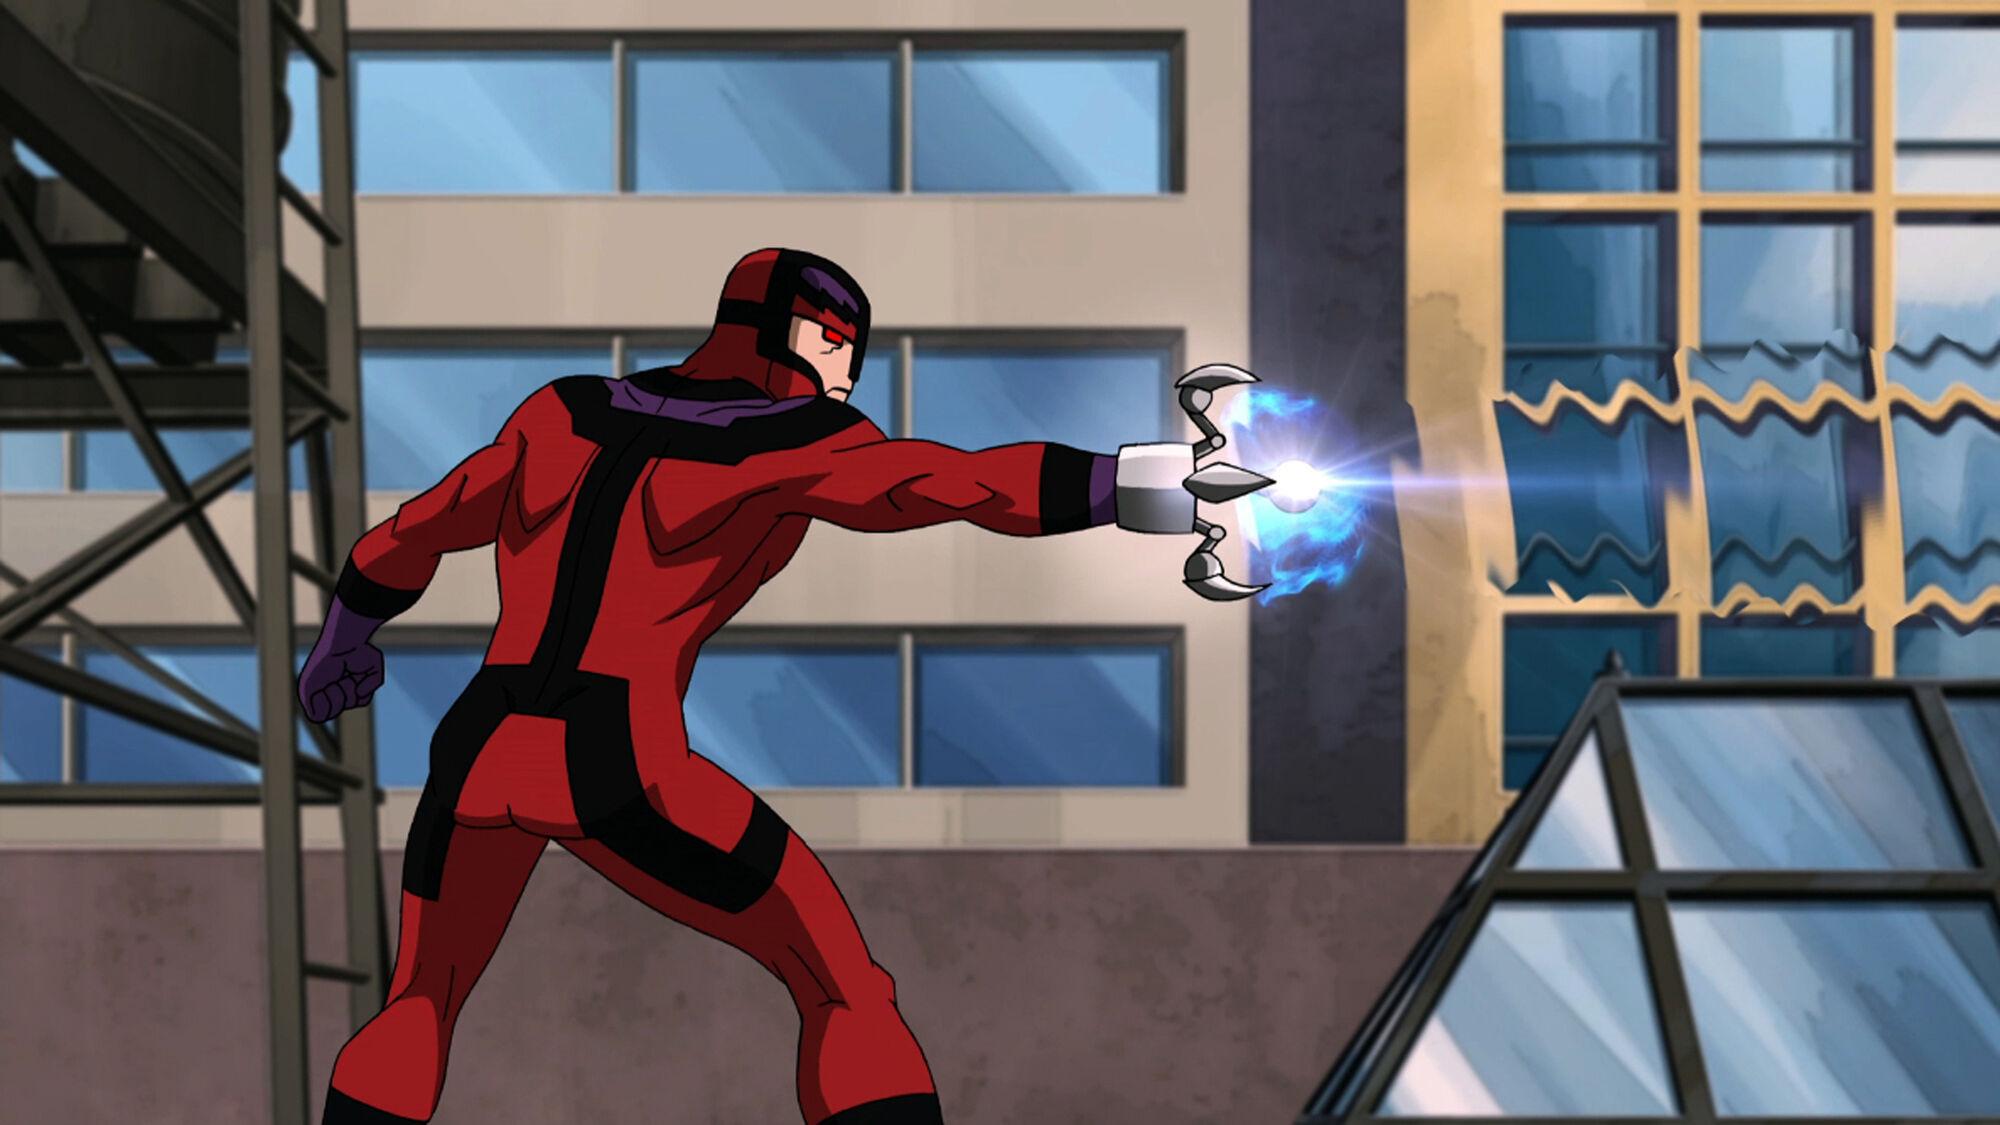 Klaw | Ultimate Spider-Man Animated Series Wiki | Fandom